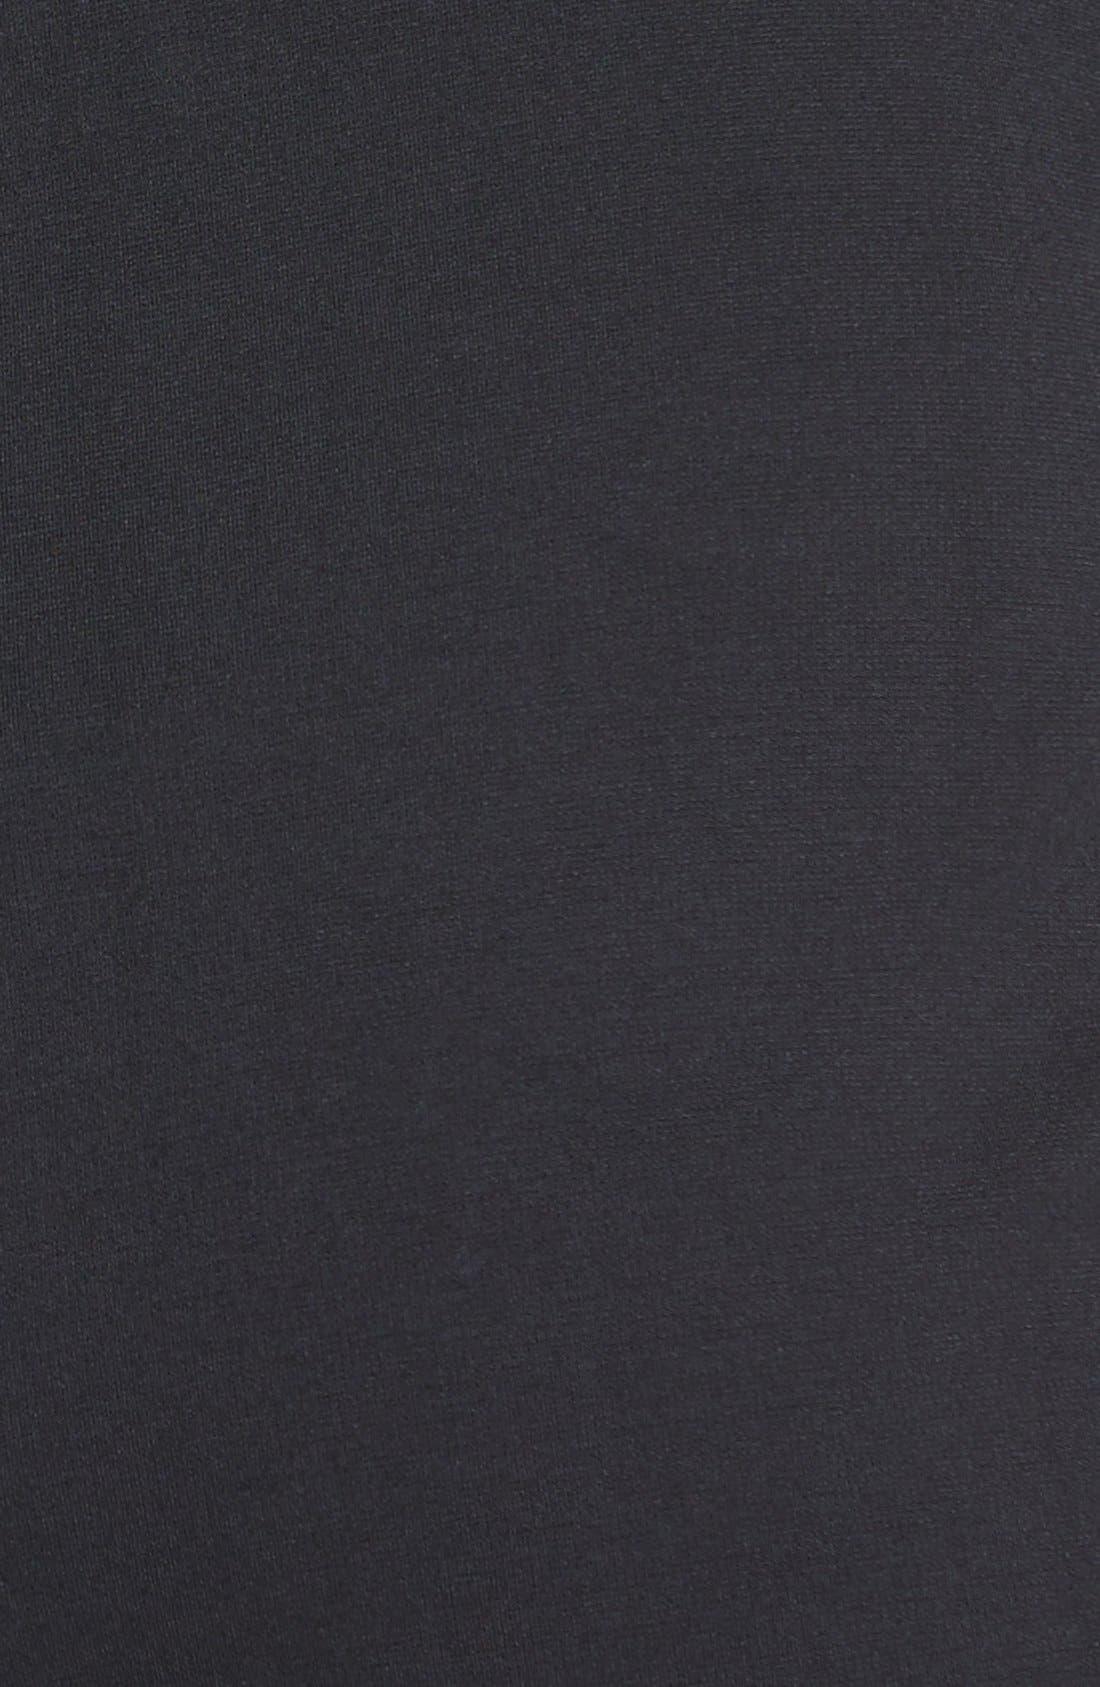 Alternate Image 3  - ASTR Illusion Body-Con Dress